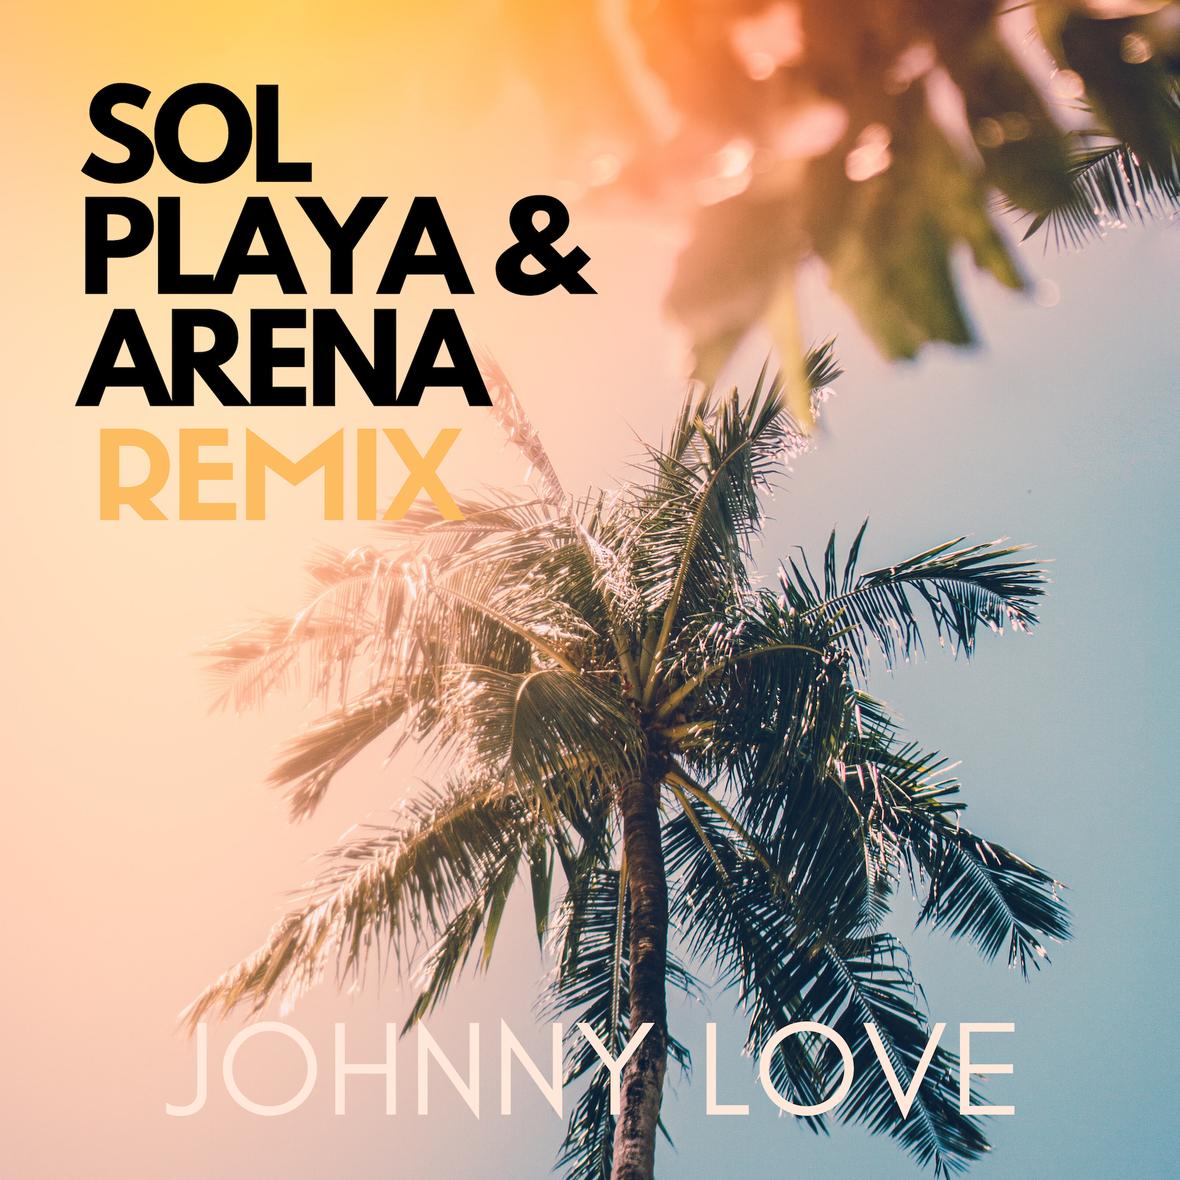 Sol Playa Arena Remix Single Cover